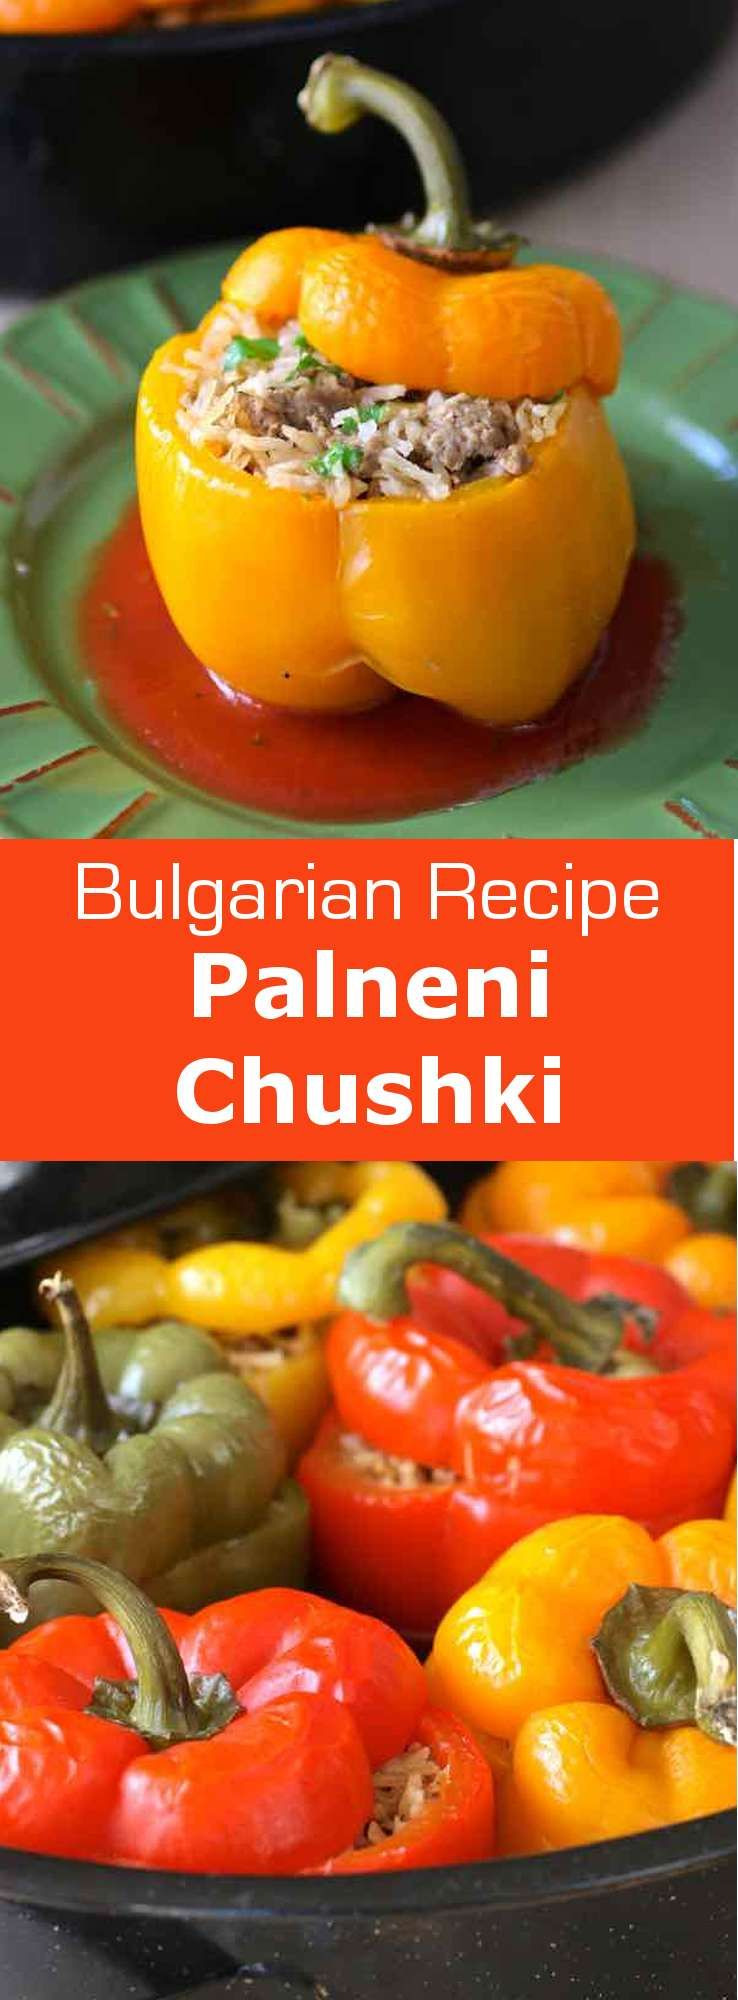 Bulgaria: Palneni Chushki (Stuffed Peppers)